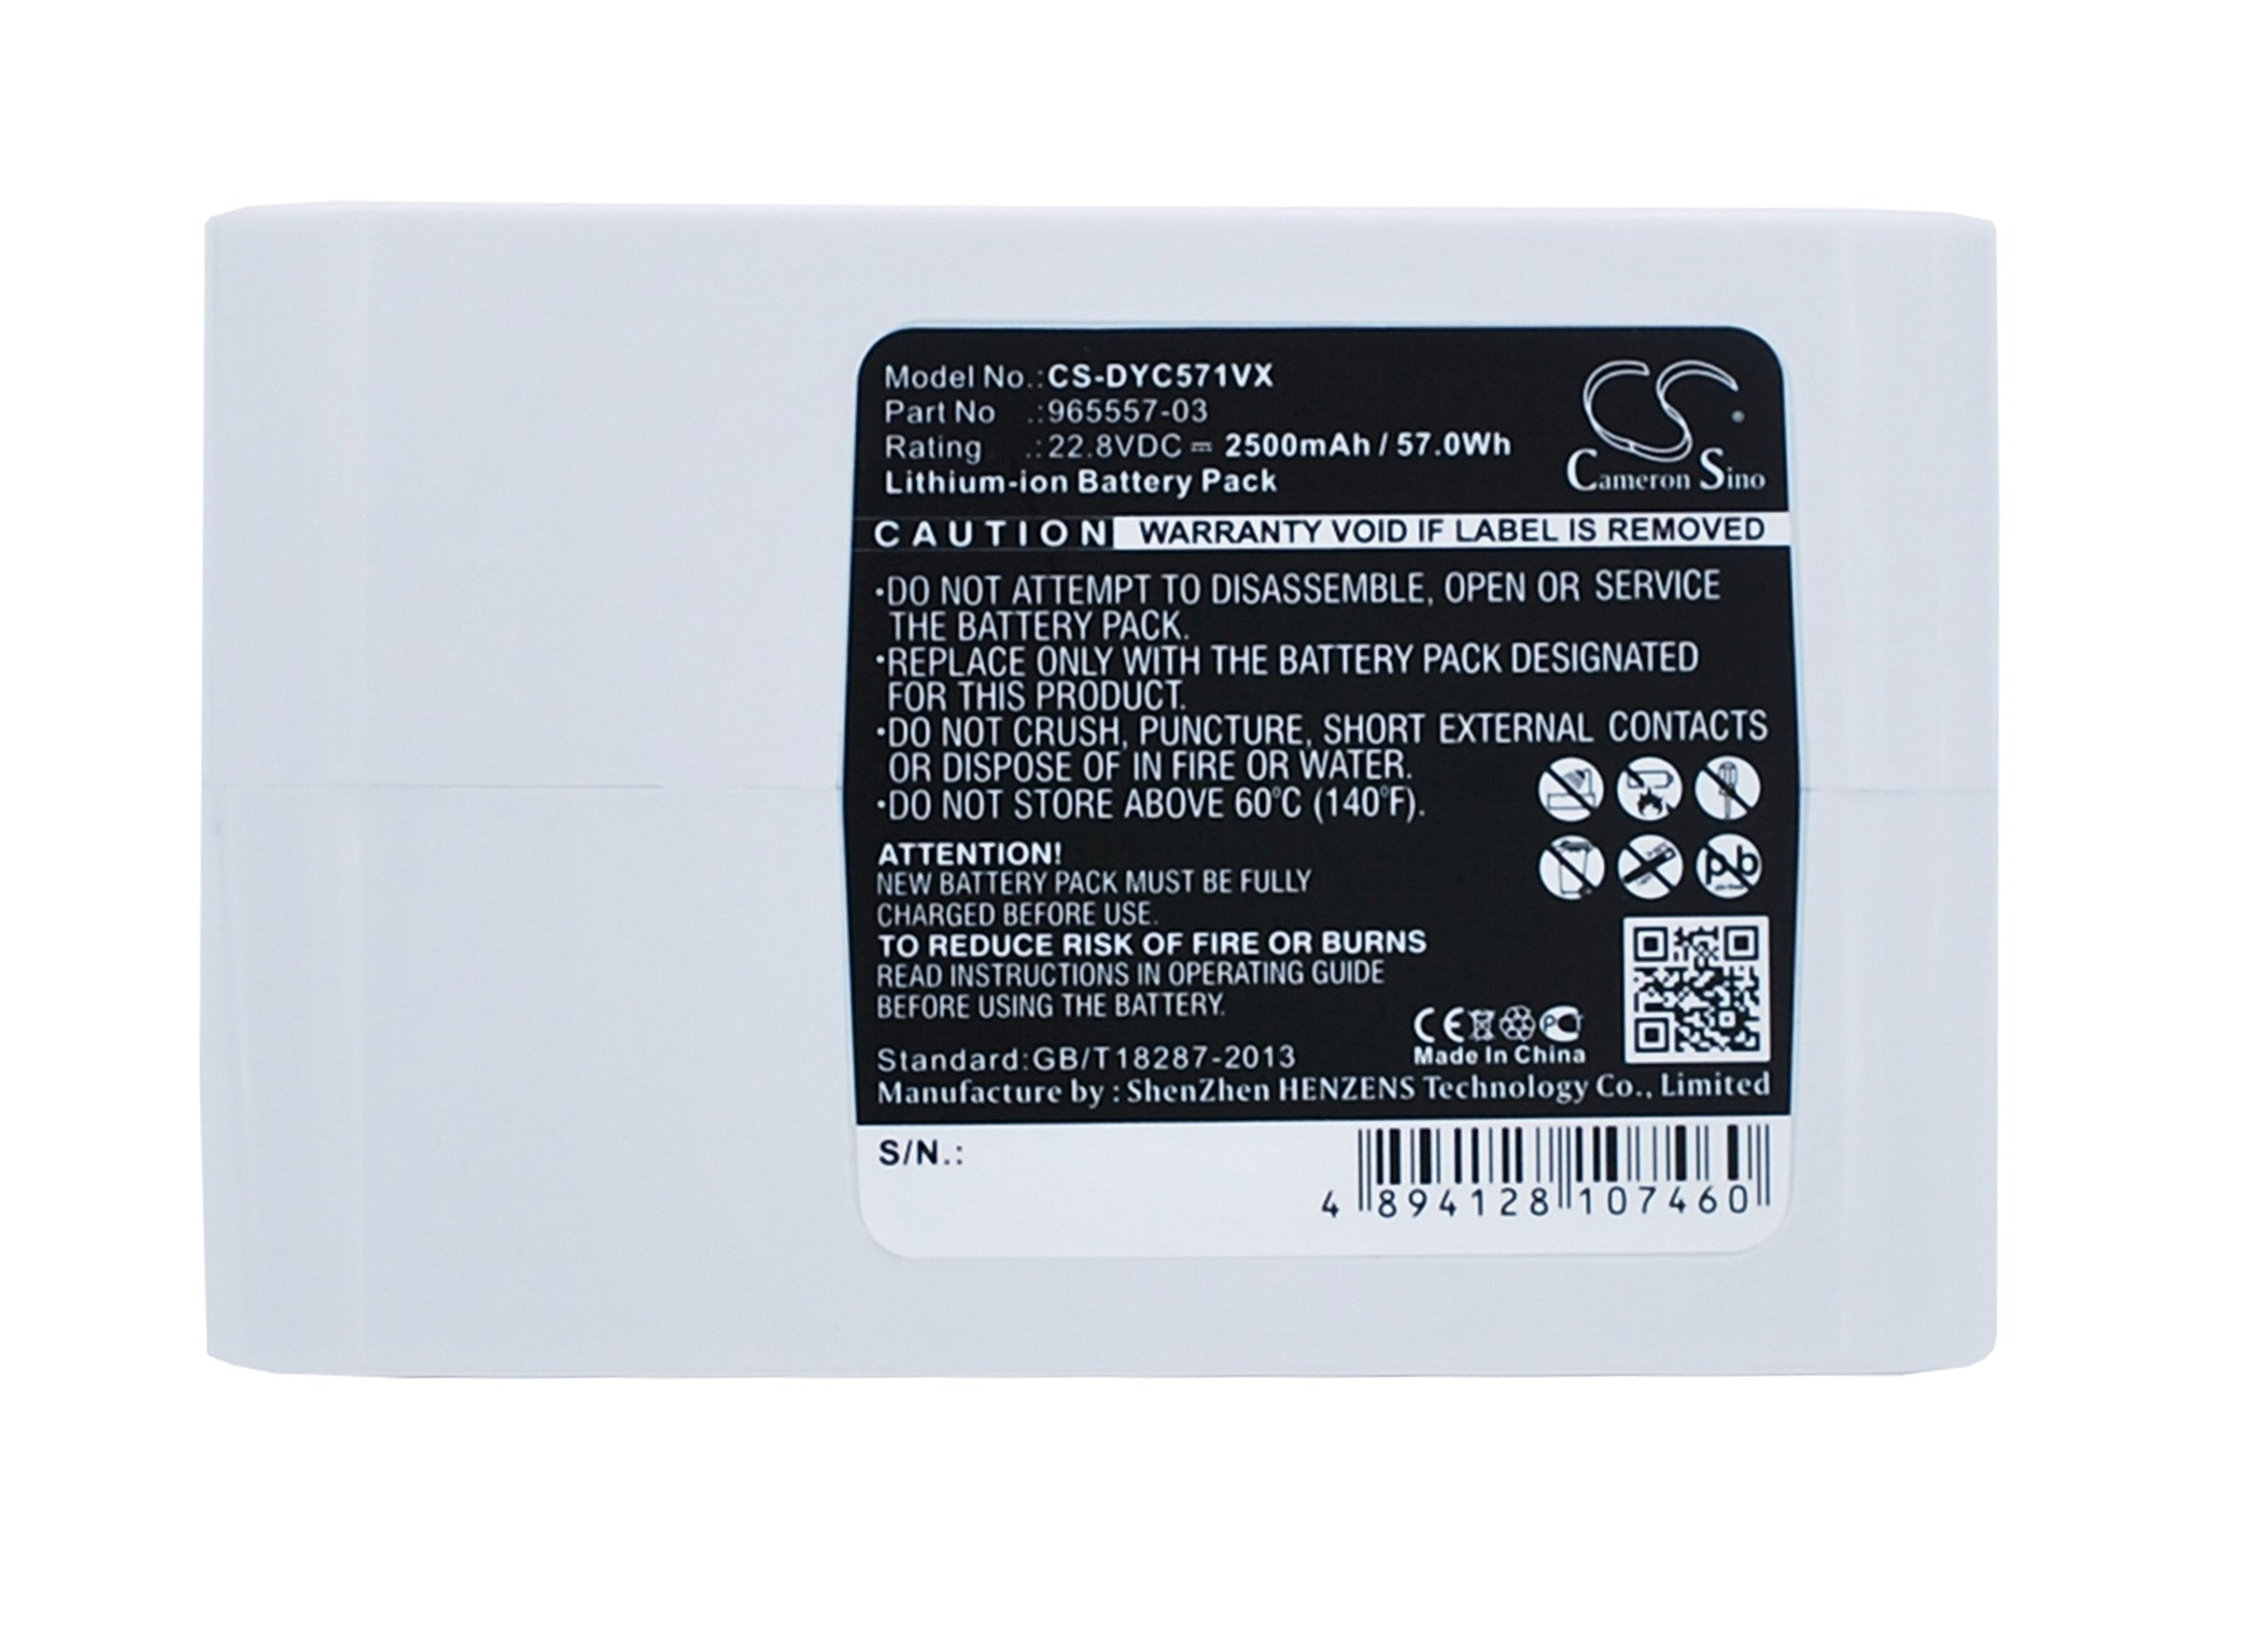 Cameron Sino 2500mAh Battery for Dyson DC31 Animal, DC34, DC34 Animal, DC35, DC35 Multi Floor, DC56, DC57 by Cameron Sino